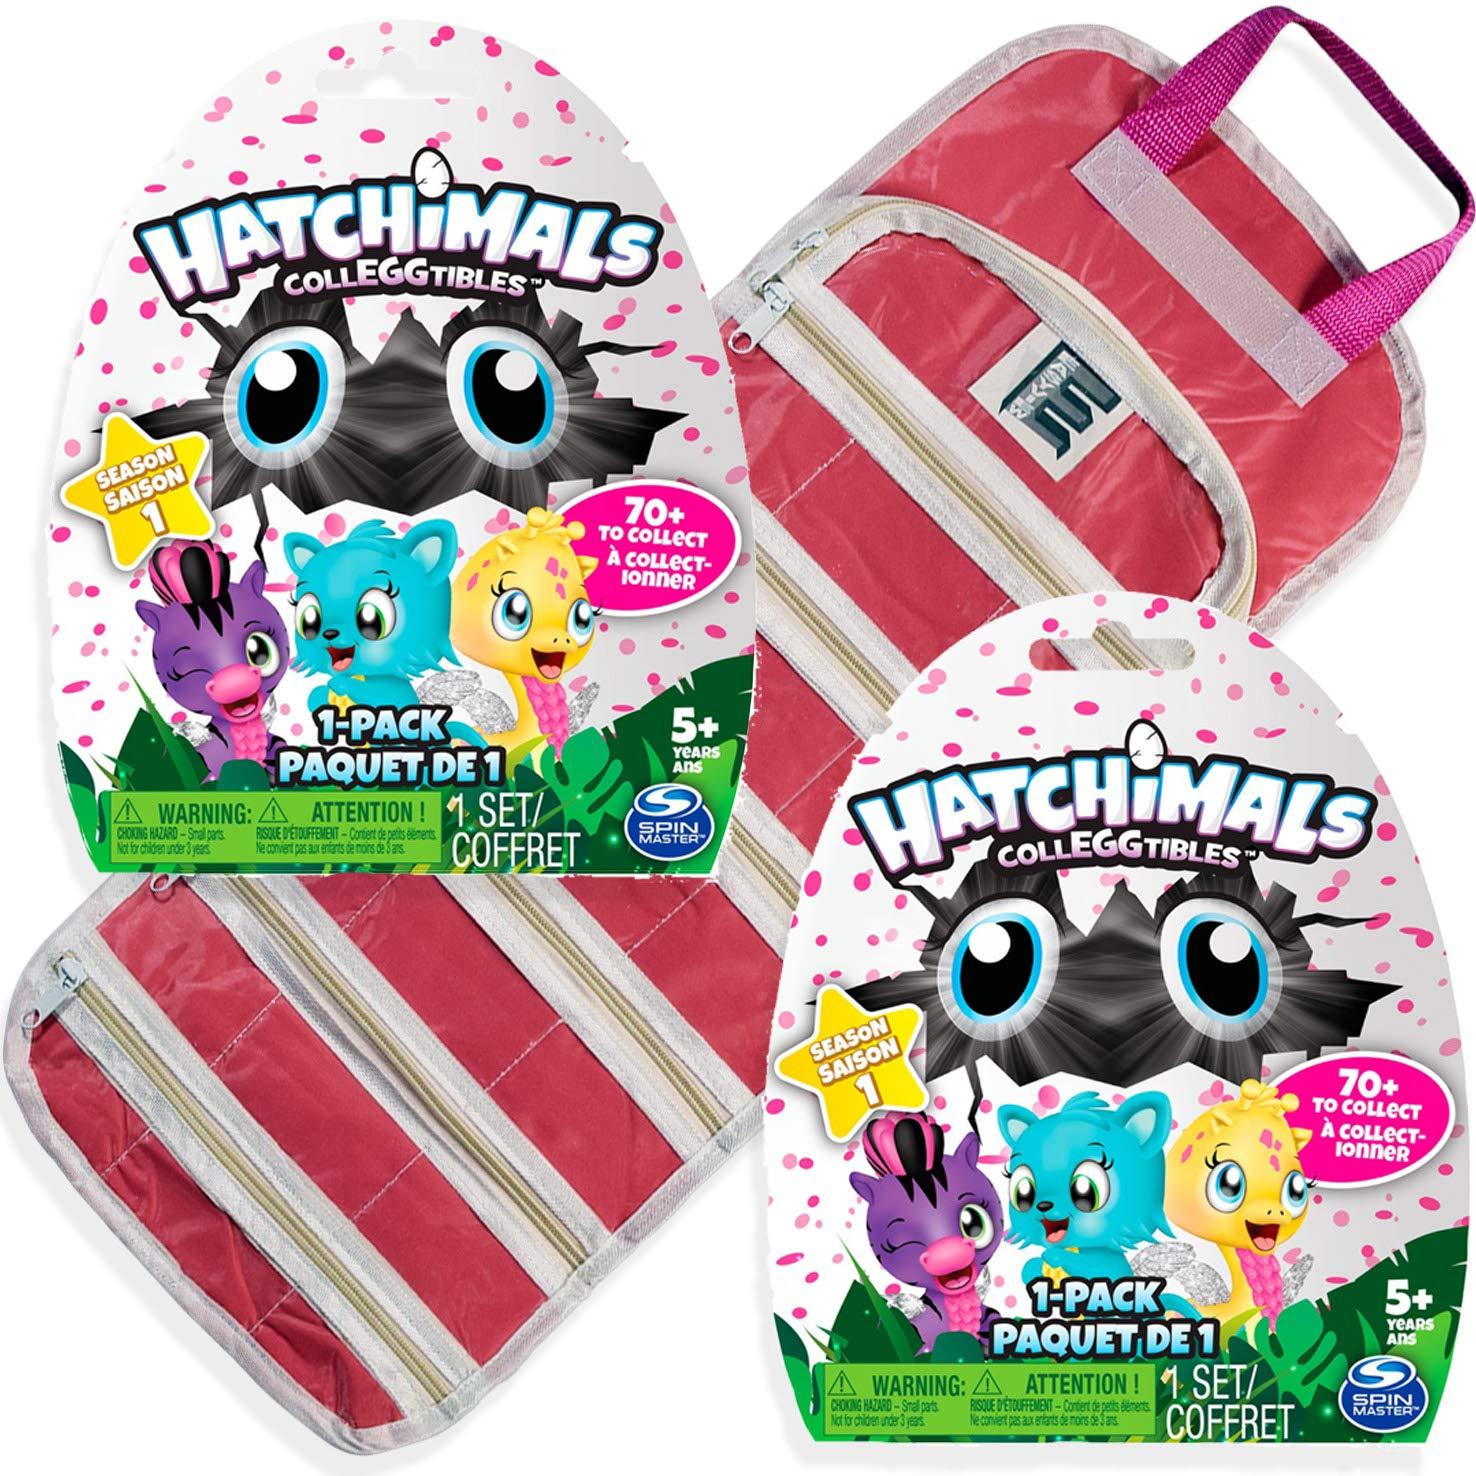 Pink-2PK EASYVIEW Toy Storage Organizer Case Compatible with Season 1 CollEGGtibles Egg 2X-Blind Packs,Hatchimals Bundle